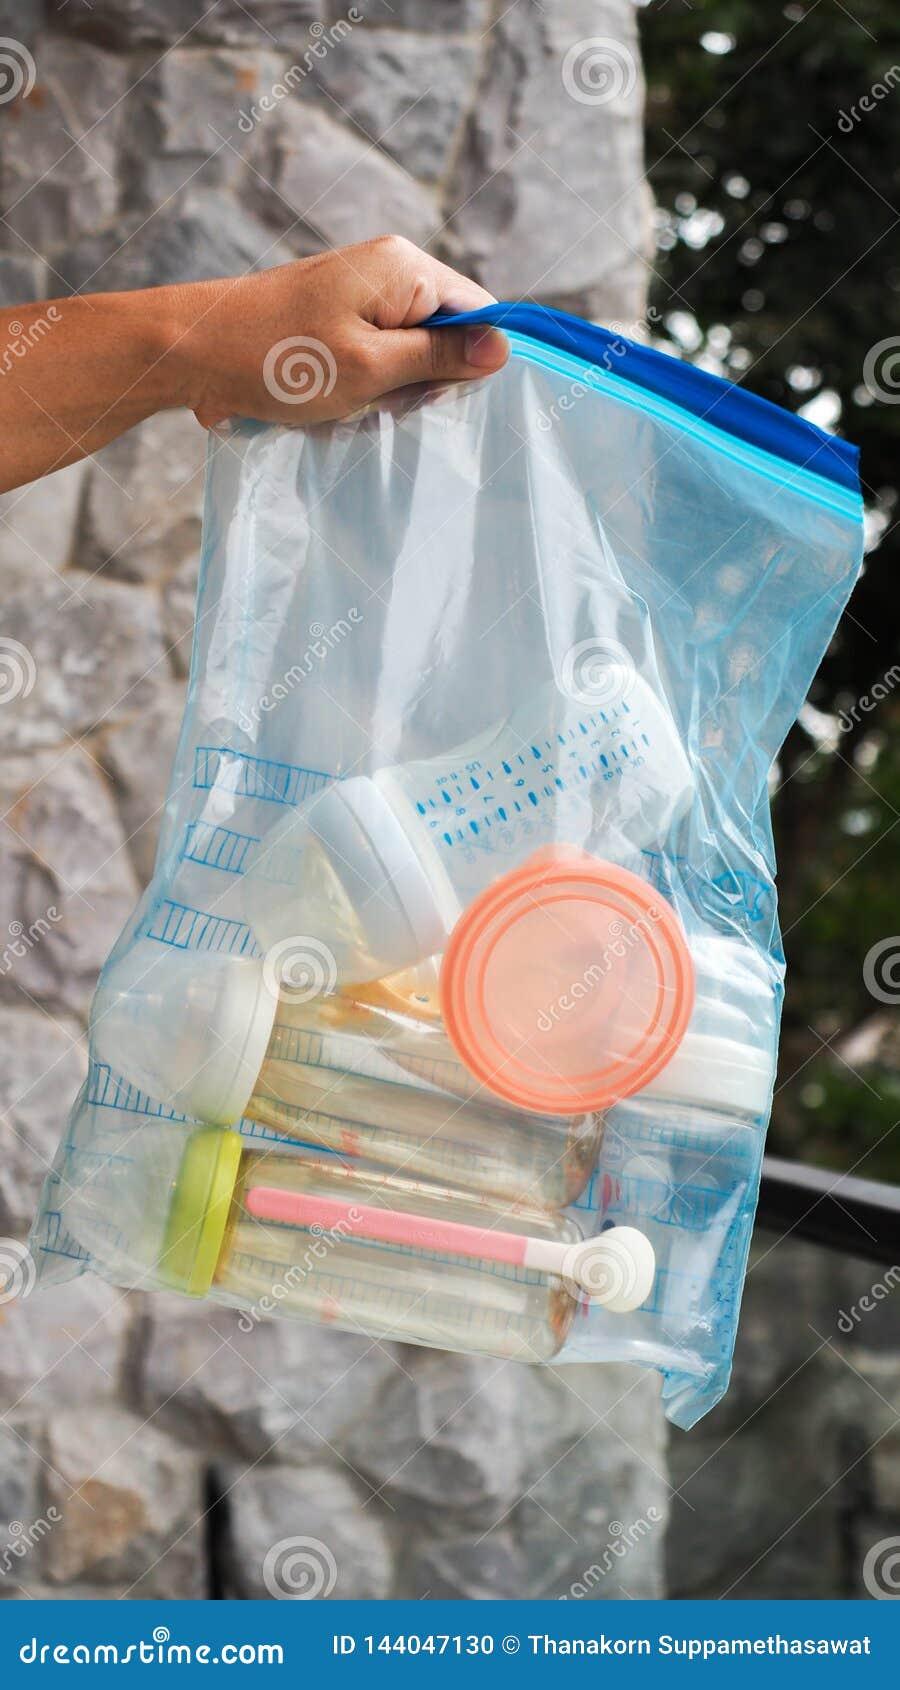 Baby Bottles In A .Zip-lock Plastic Bags Stock Photo ...